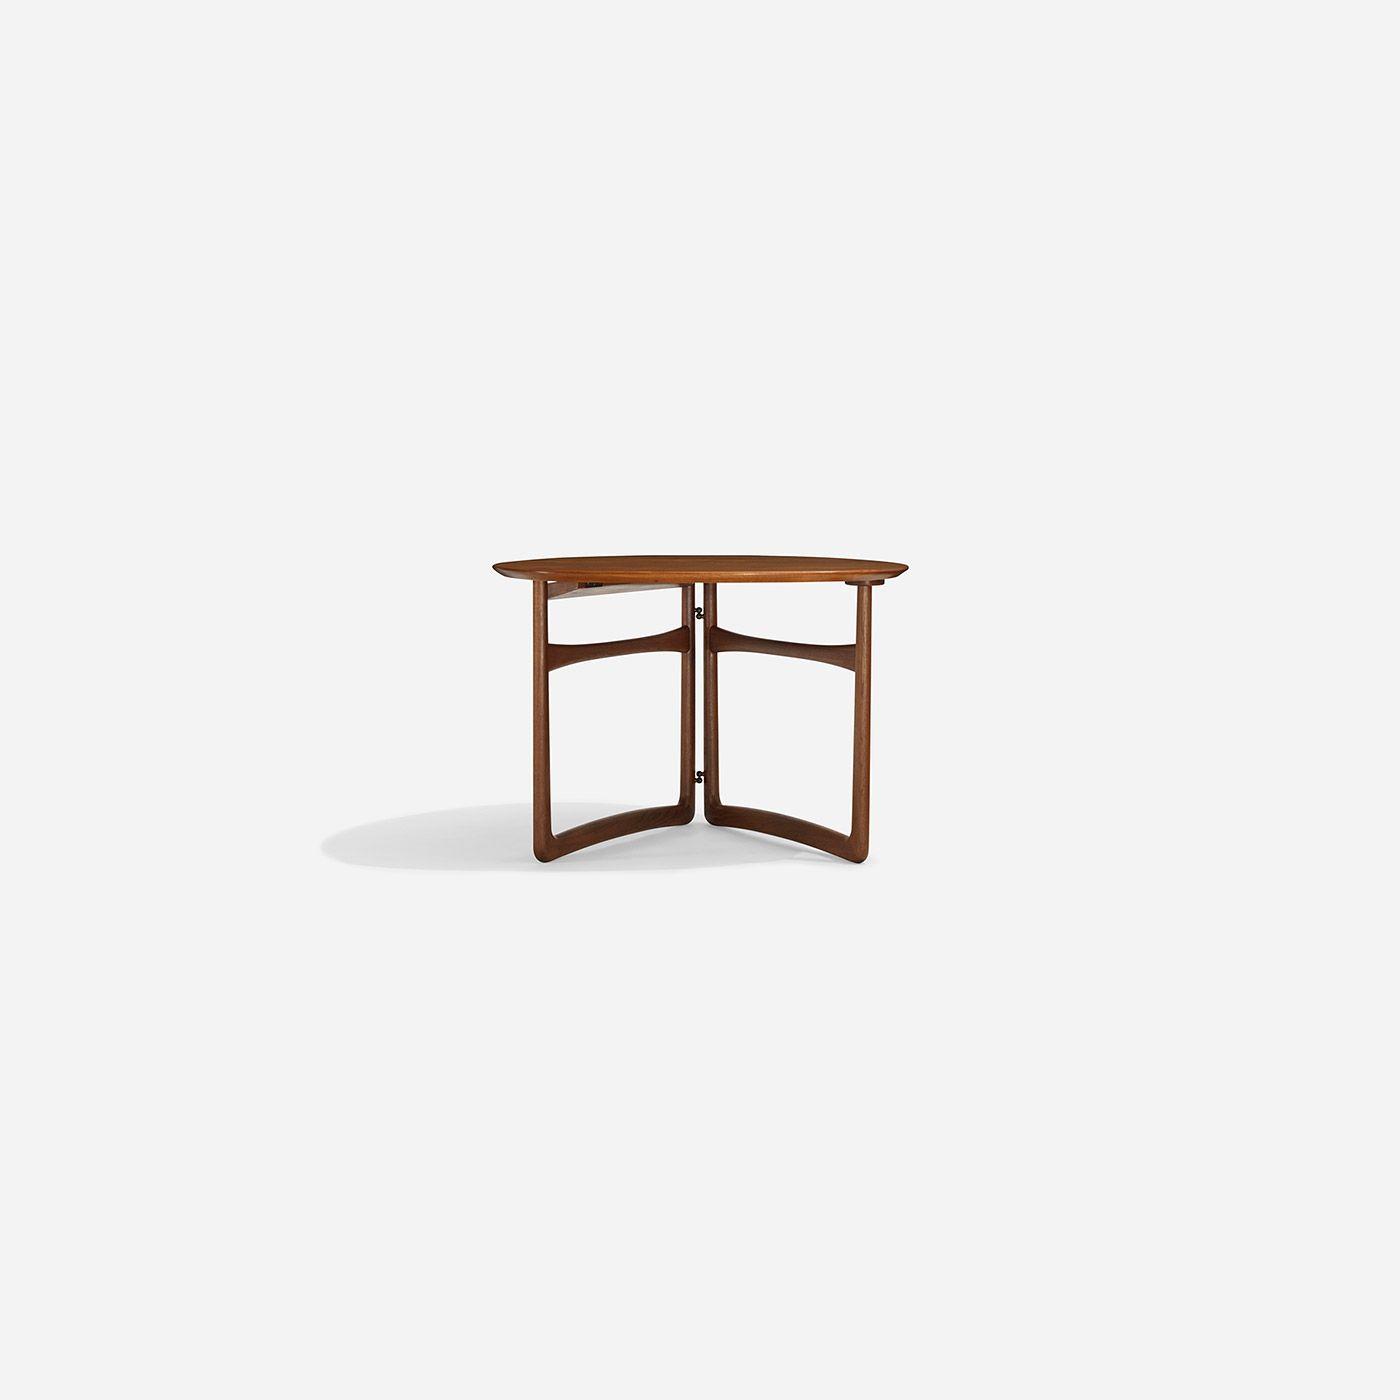 386: Peter Hvidt and Orla Mølgaard-Nielsen / folding table < Scandinavian Design, 14 November 2013 < Auctions | Wright